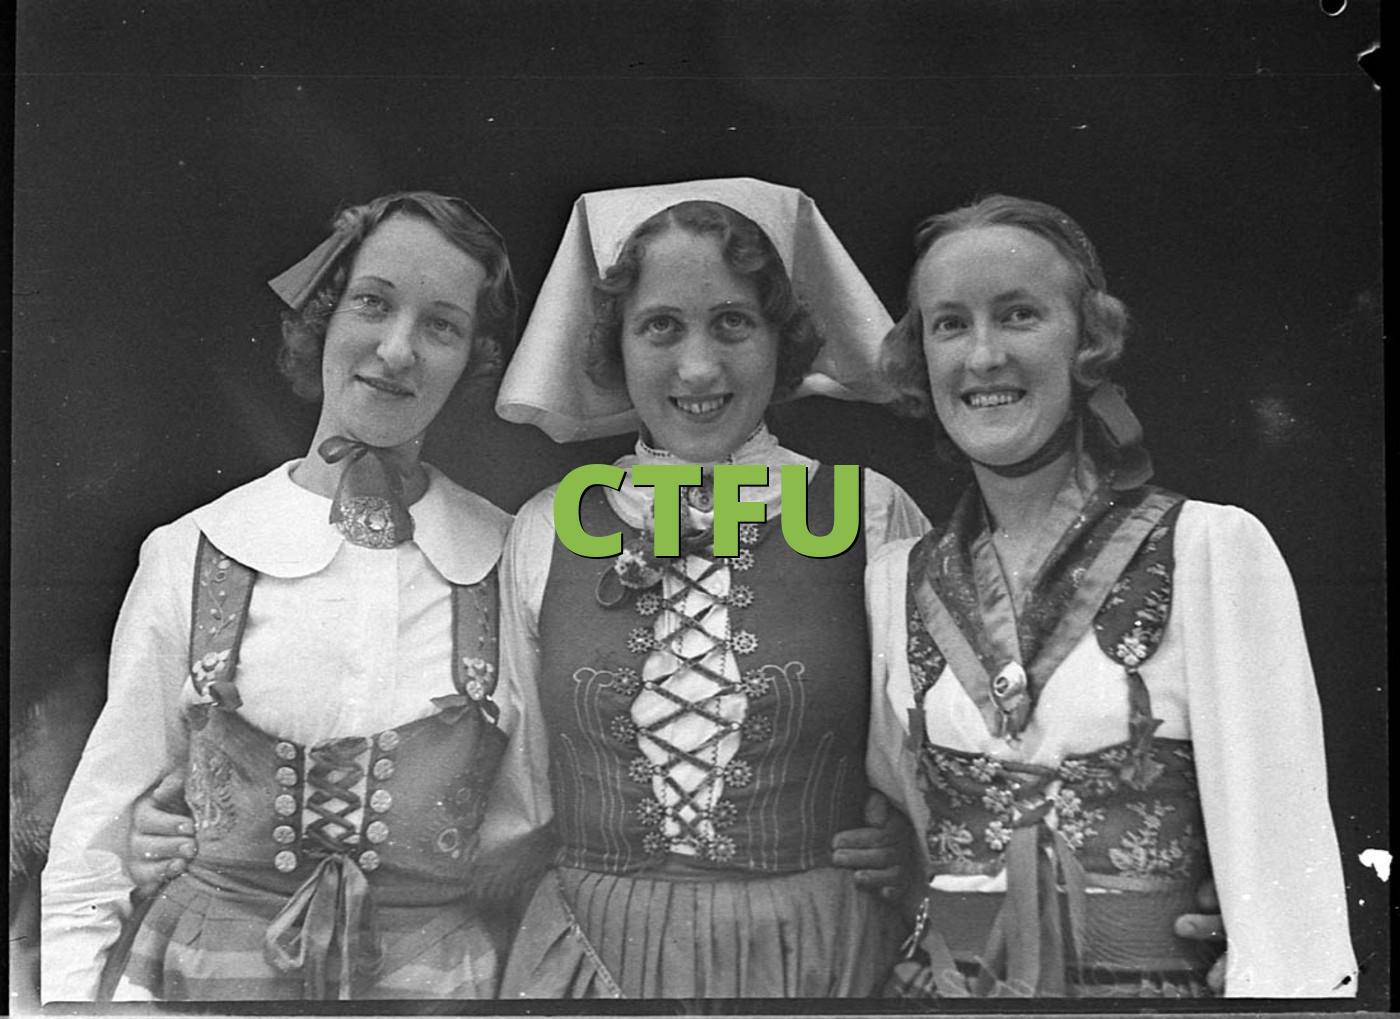 Ctfu What Does Ctfu Mean Slang Org